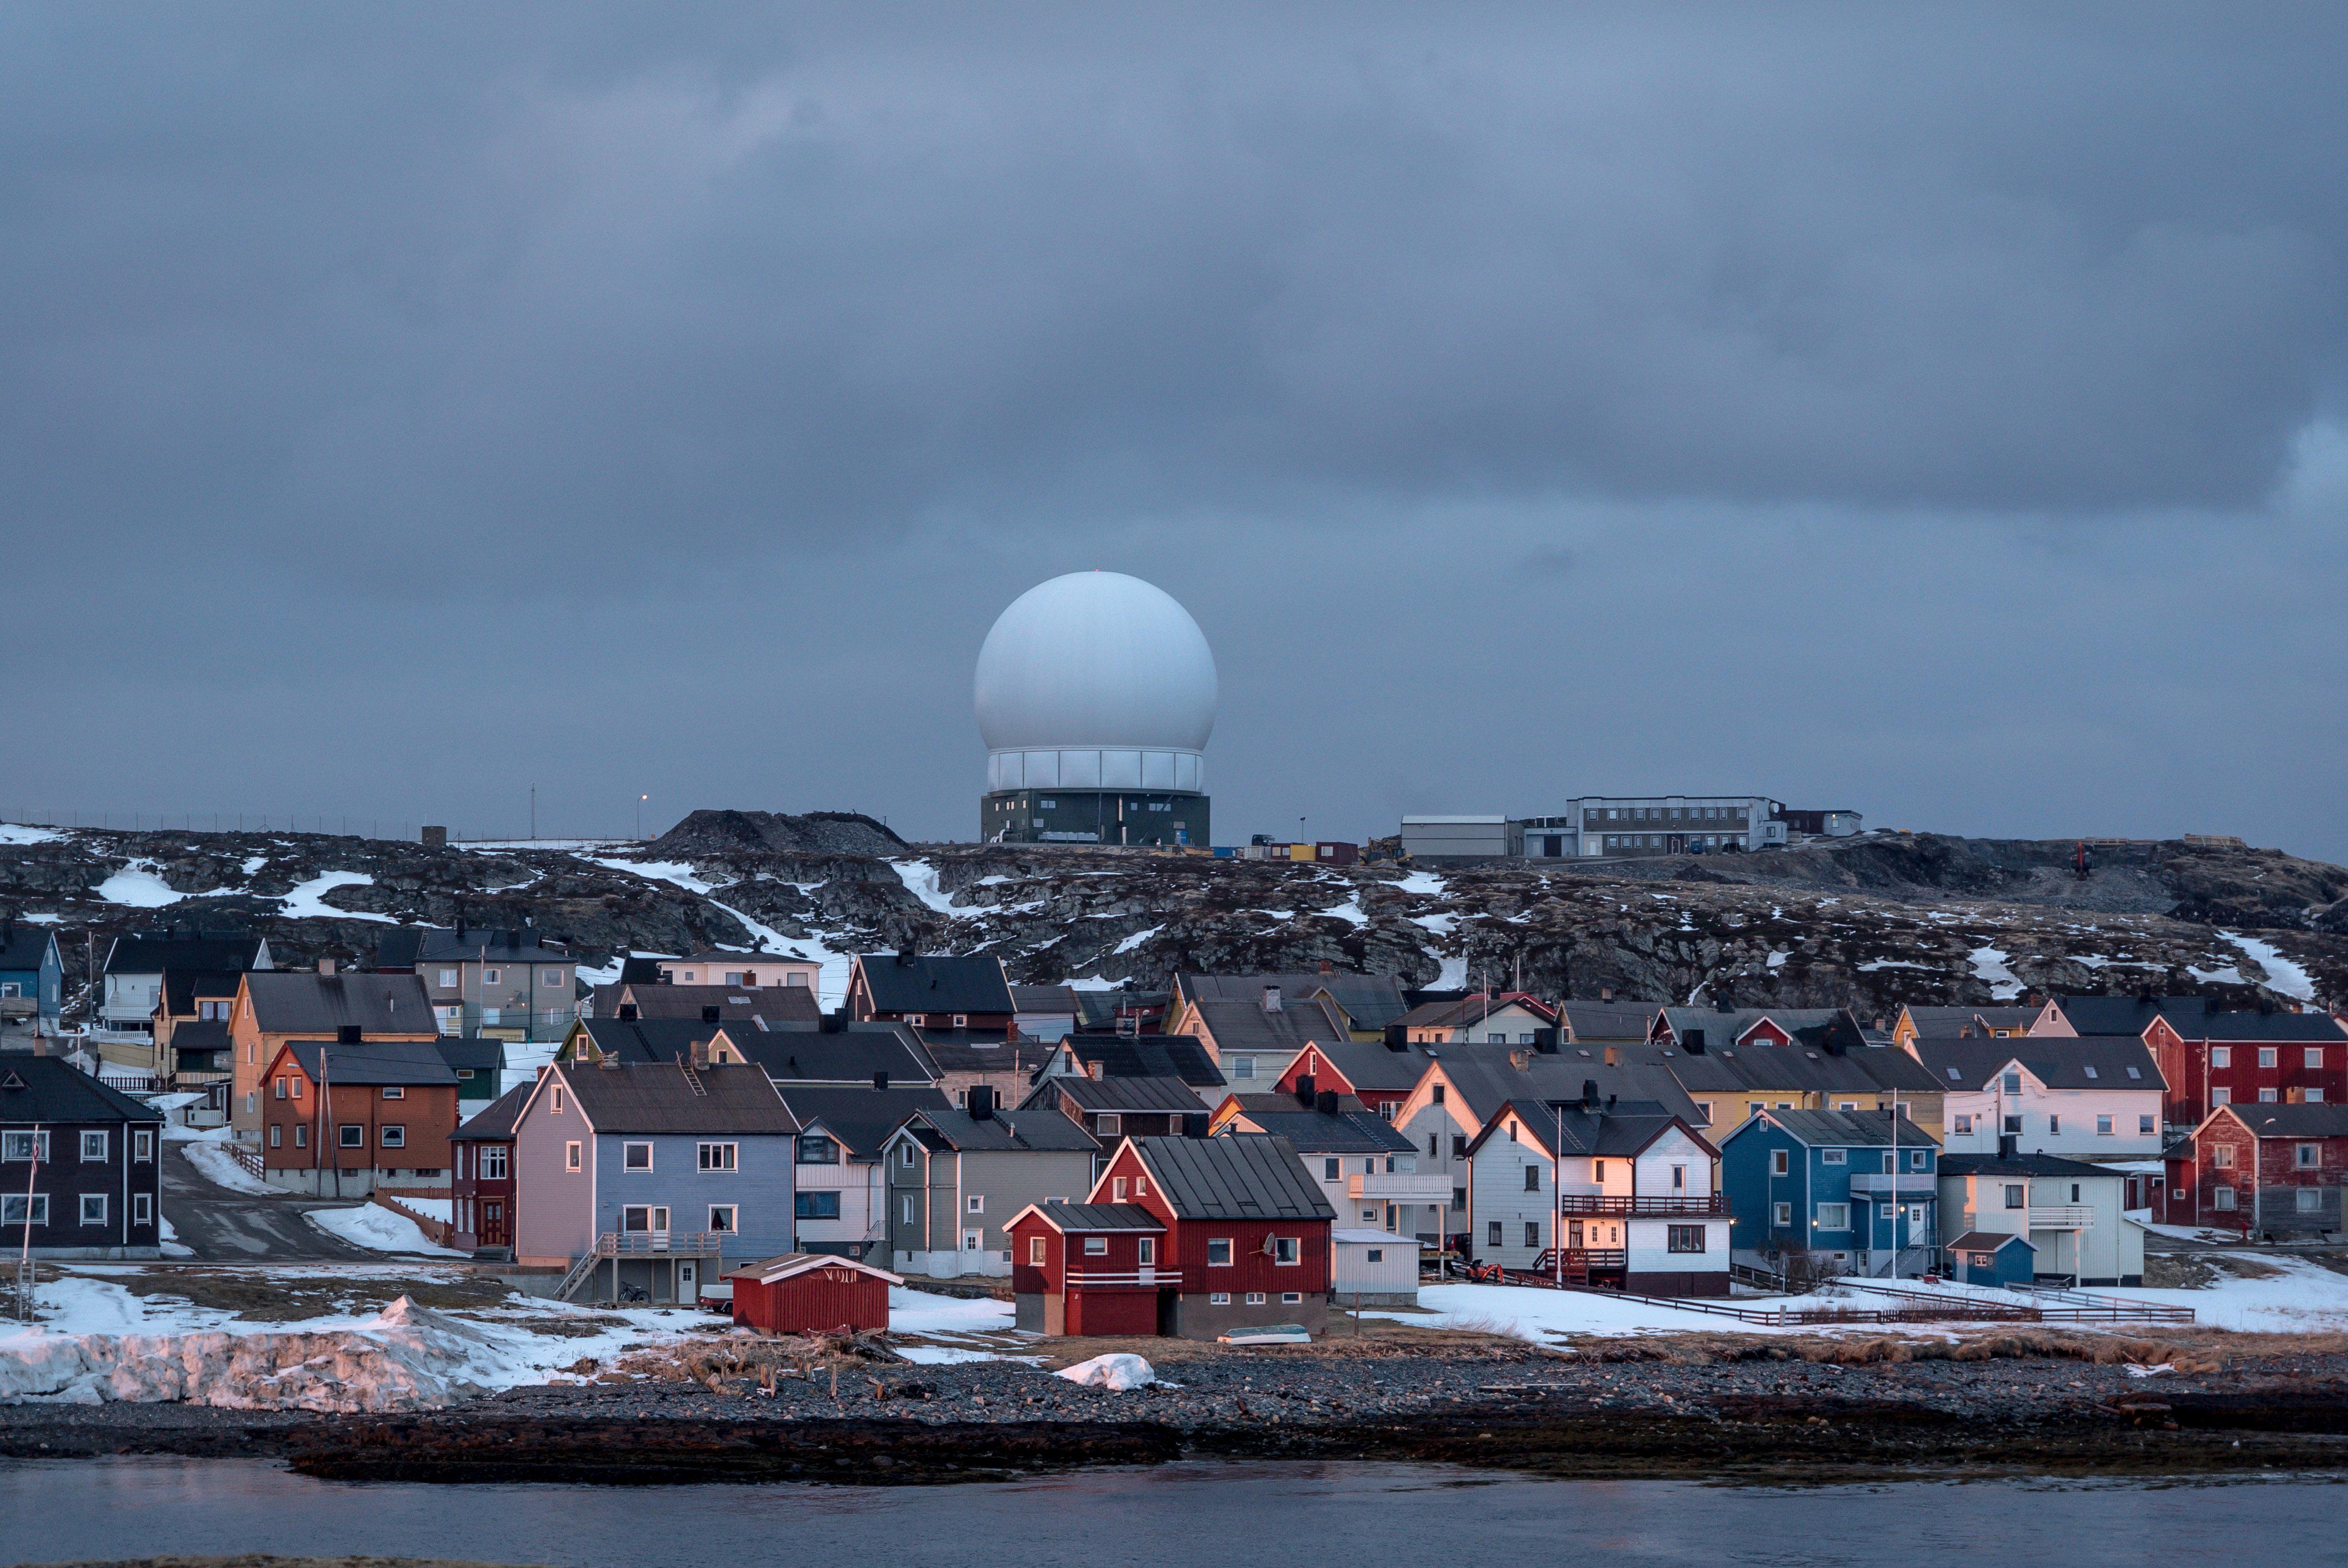 On a tiny Norwegian island, America keeps an eye on Russia